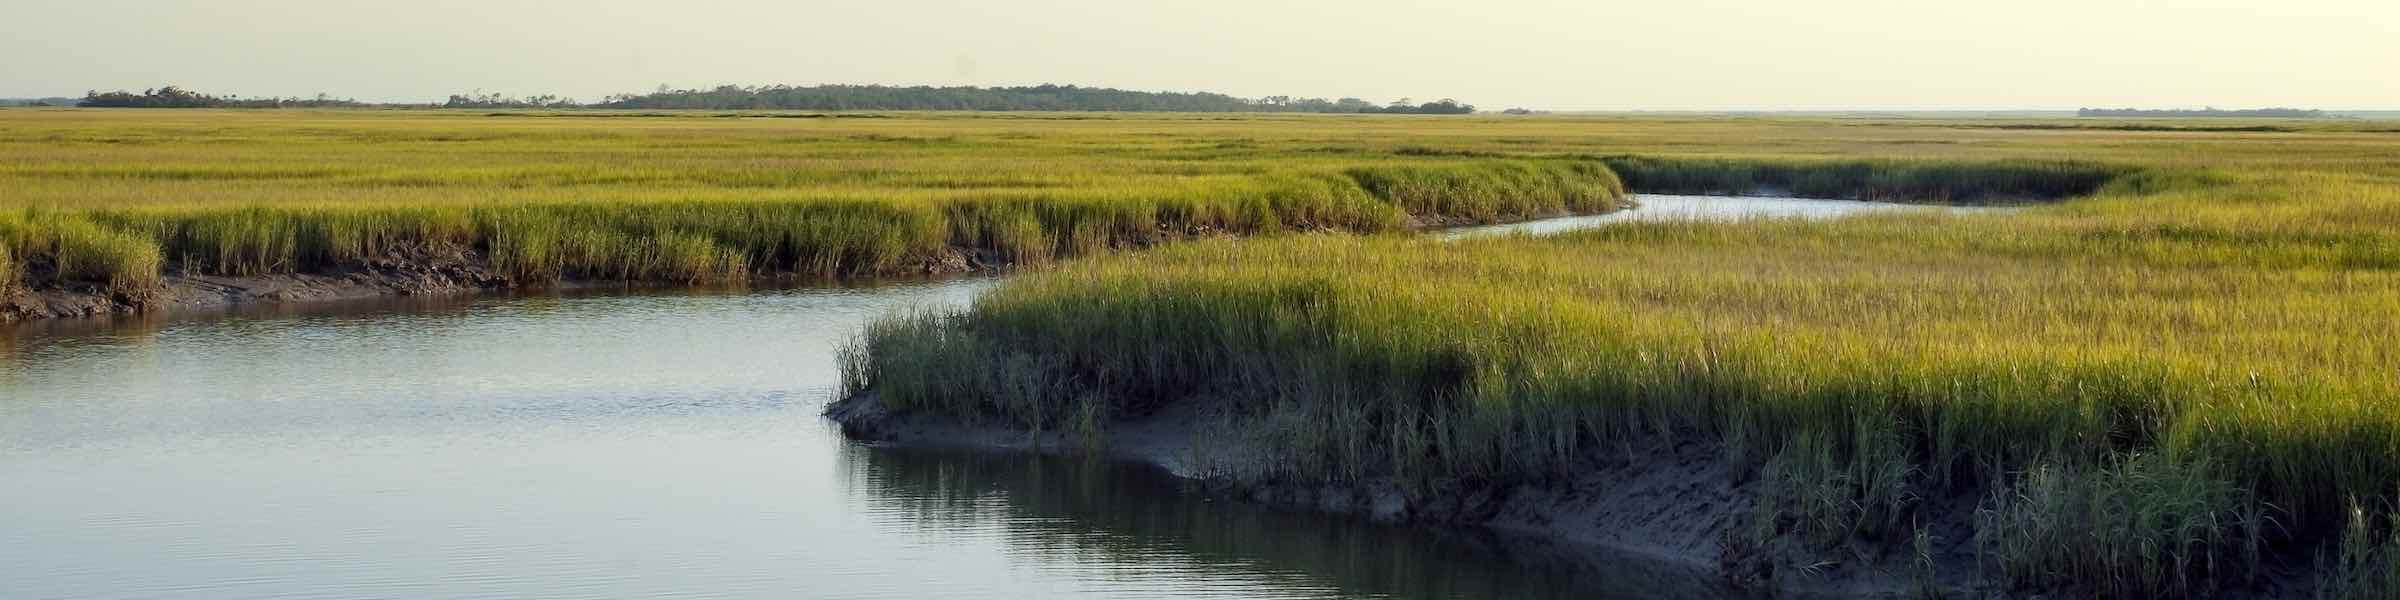 Peaceful marsh scene at Tybee Island, GA.